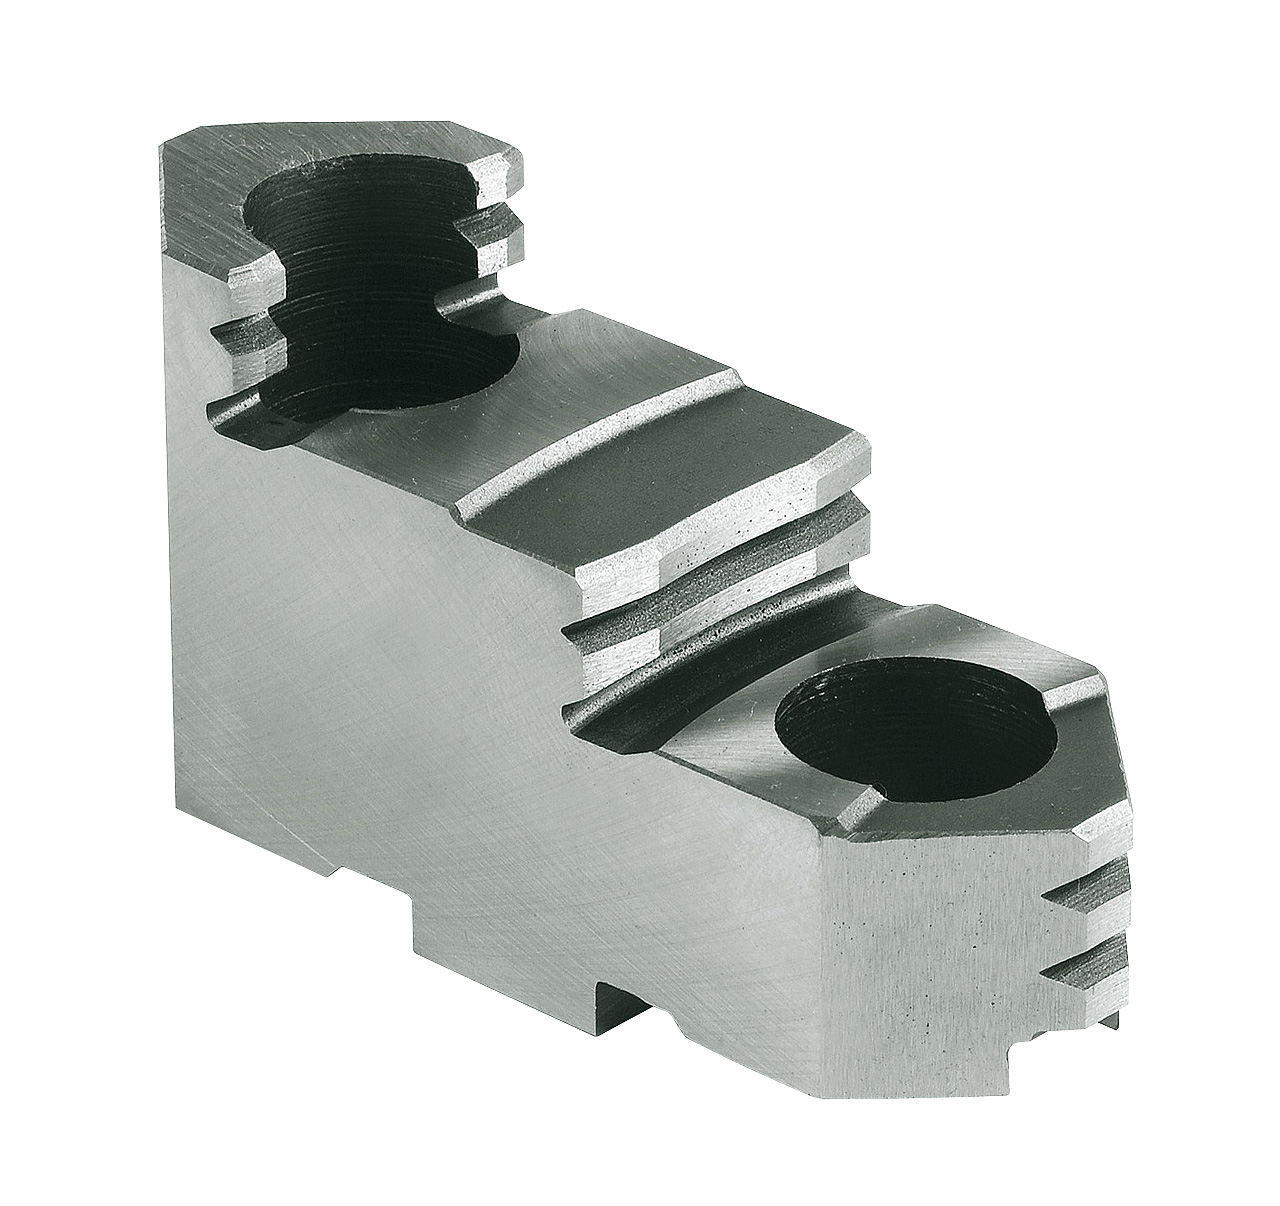 Szczęki górne twarde - komplet TJ-PS4-500 BERNARDO